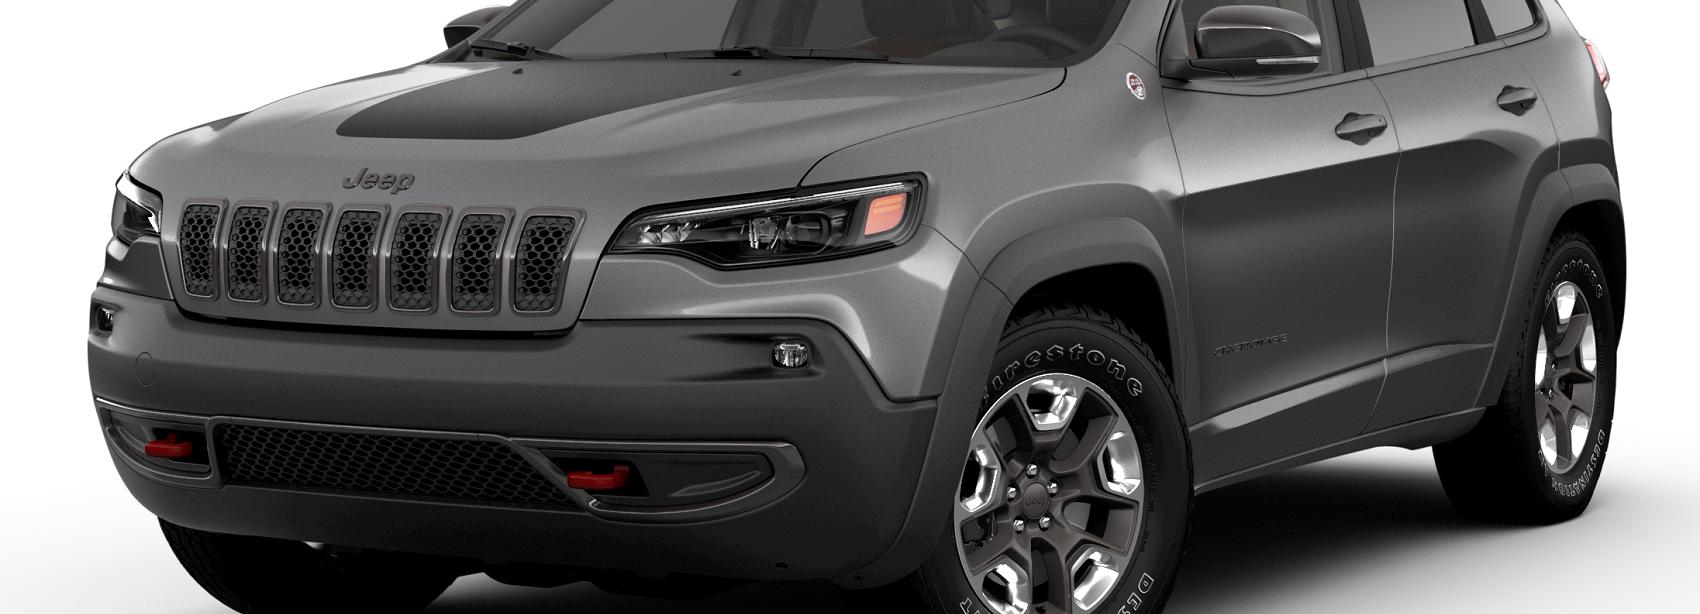 Lease A Jeep Cherokee In Medford Ma Grava Cdjr Srt